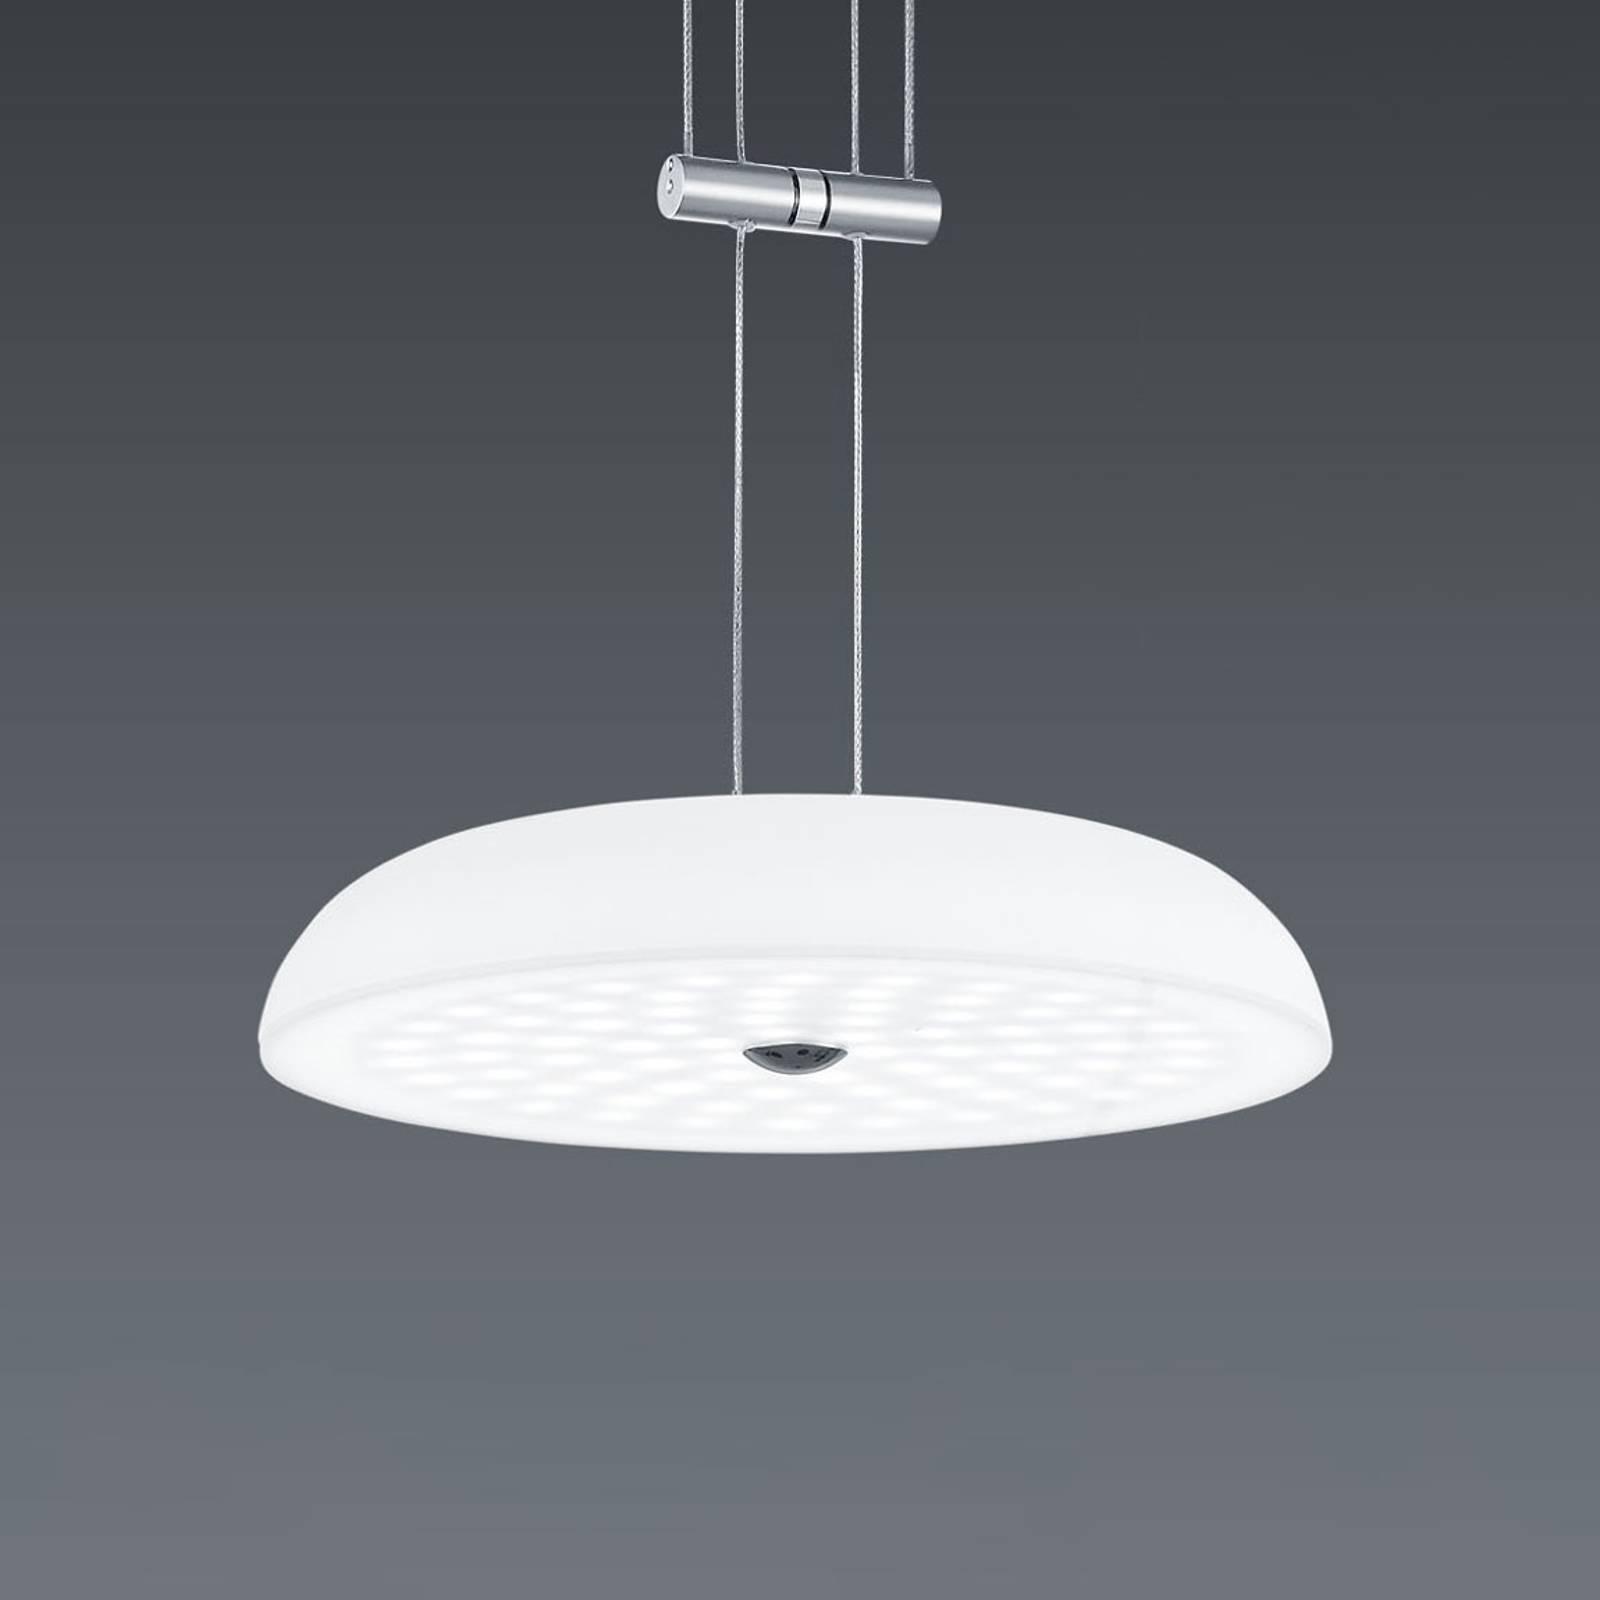 BANKAMP Vanity -riippuvalo, 1-lamp. nikkeli Ø25 cm